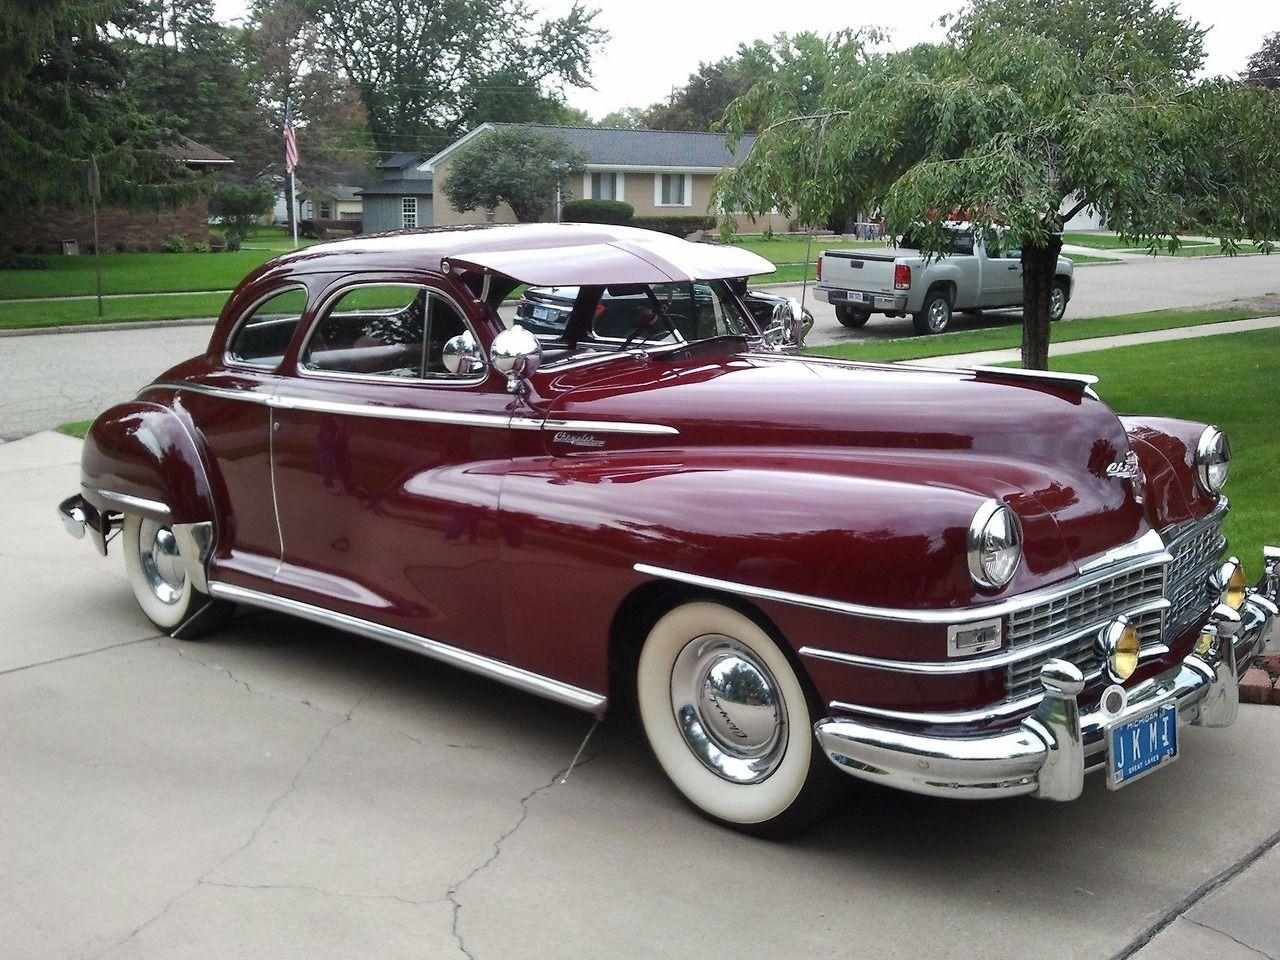 1947 Chrysler Saratoga Club Coupé | Automotive | Pinterest